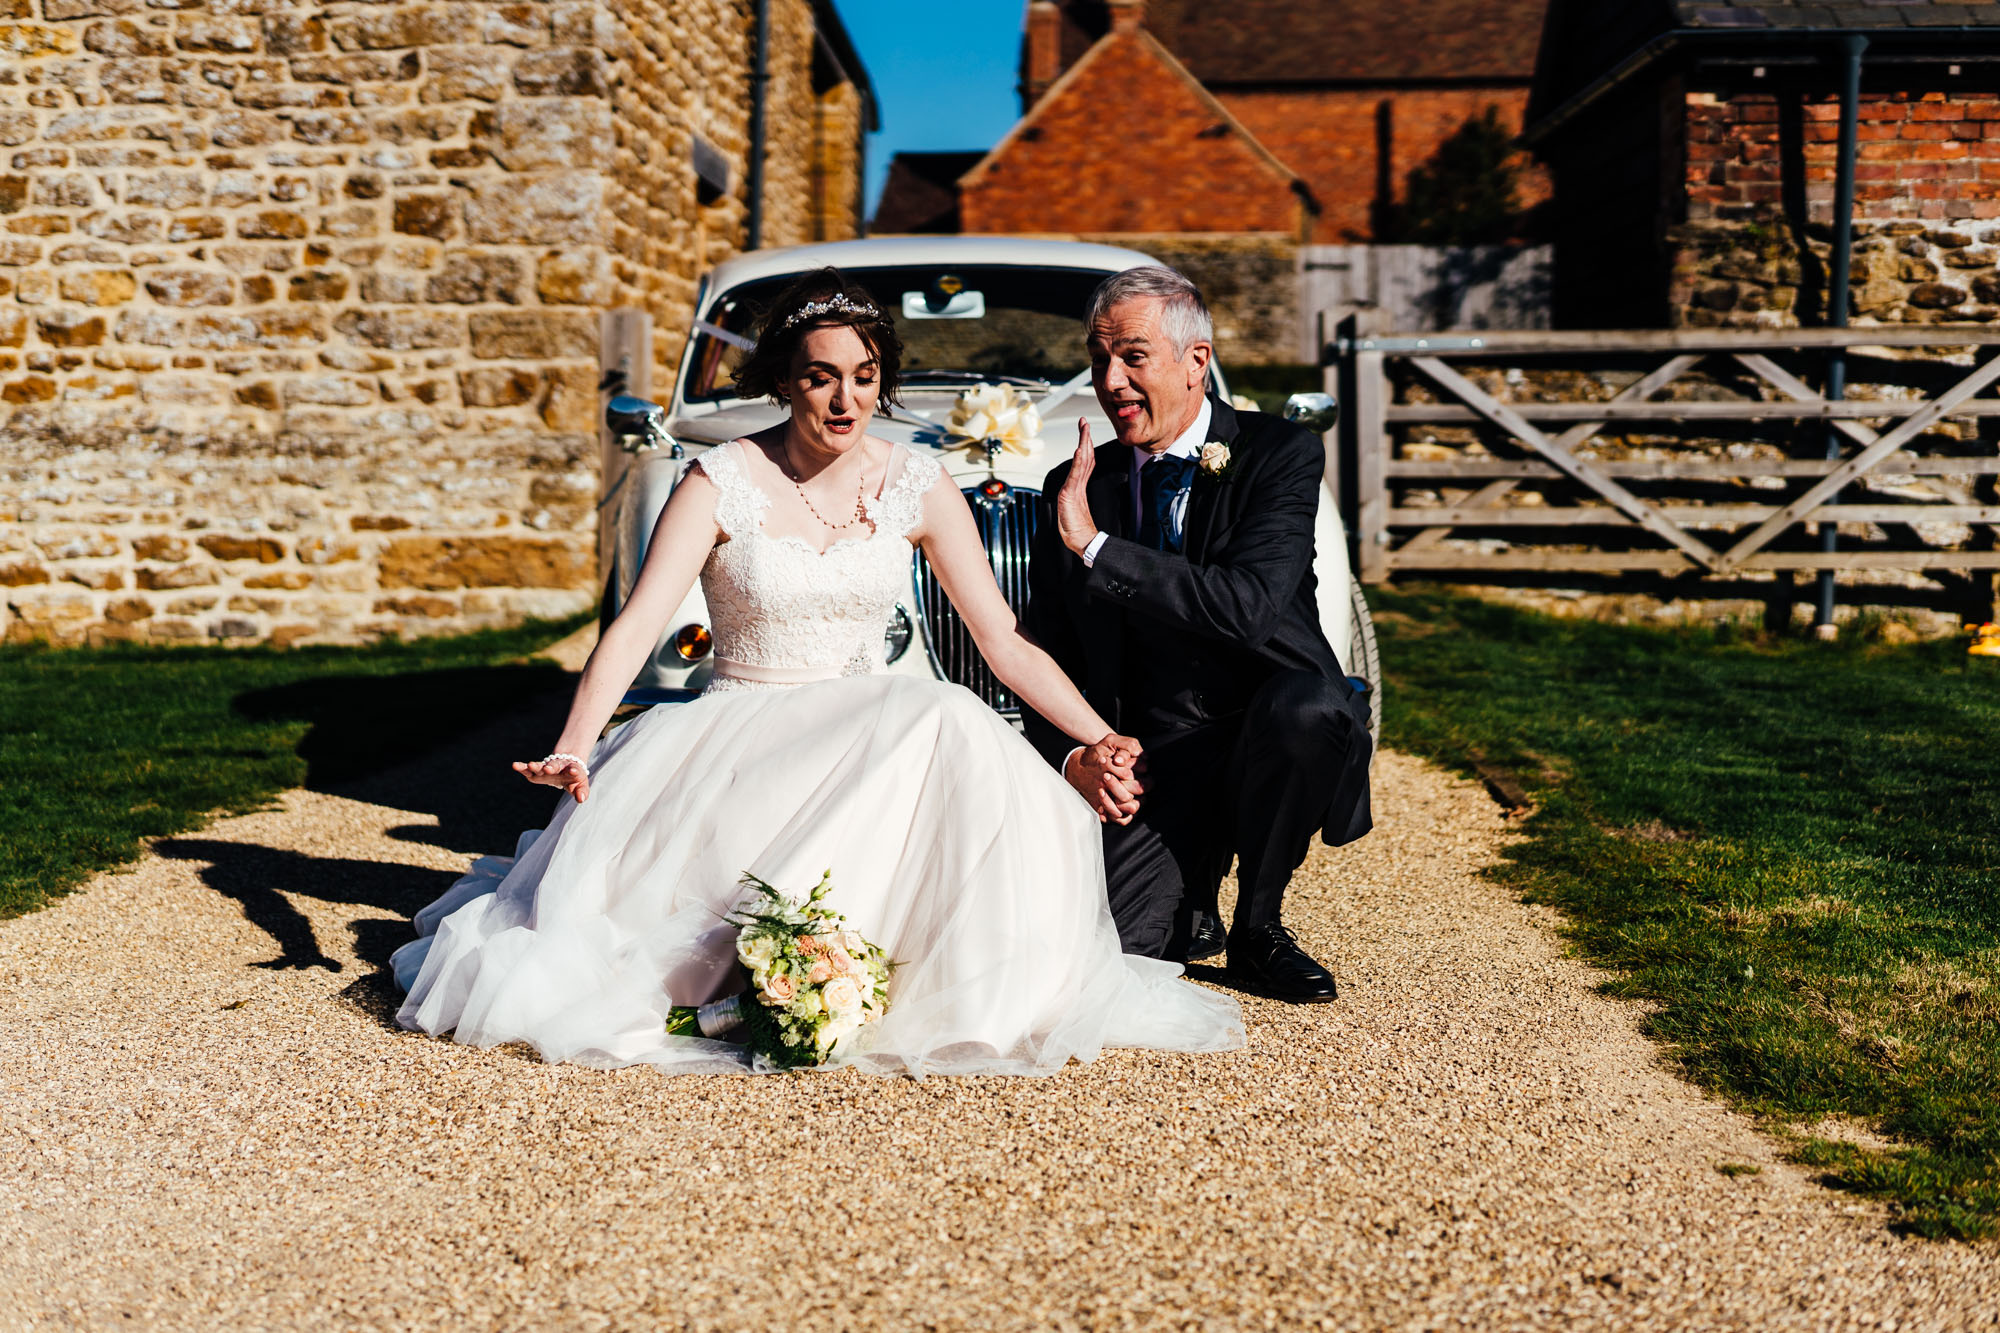 wedding-at-dodford-manor-52